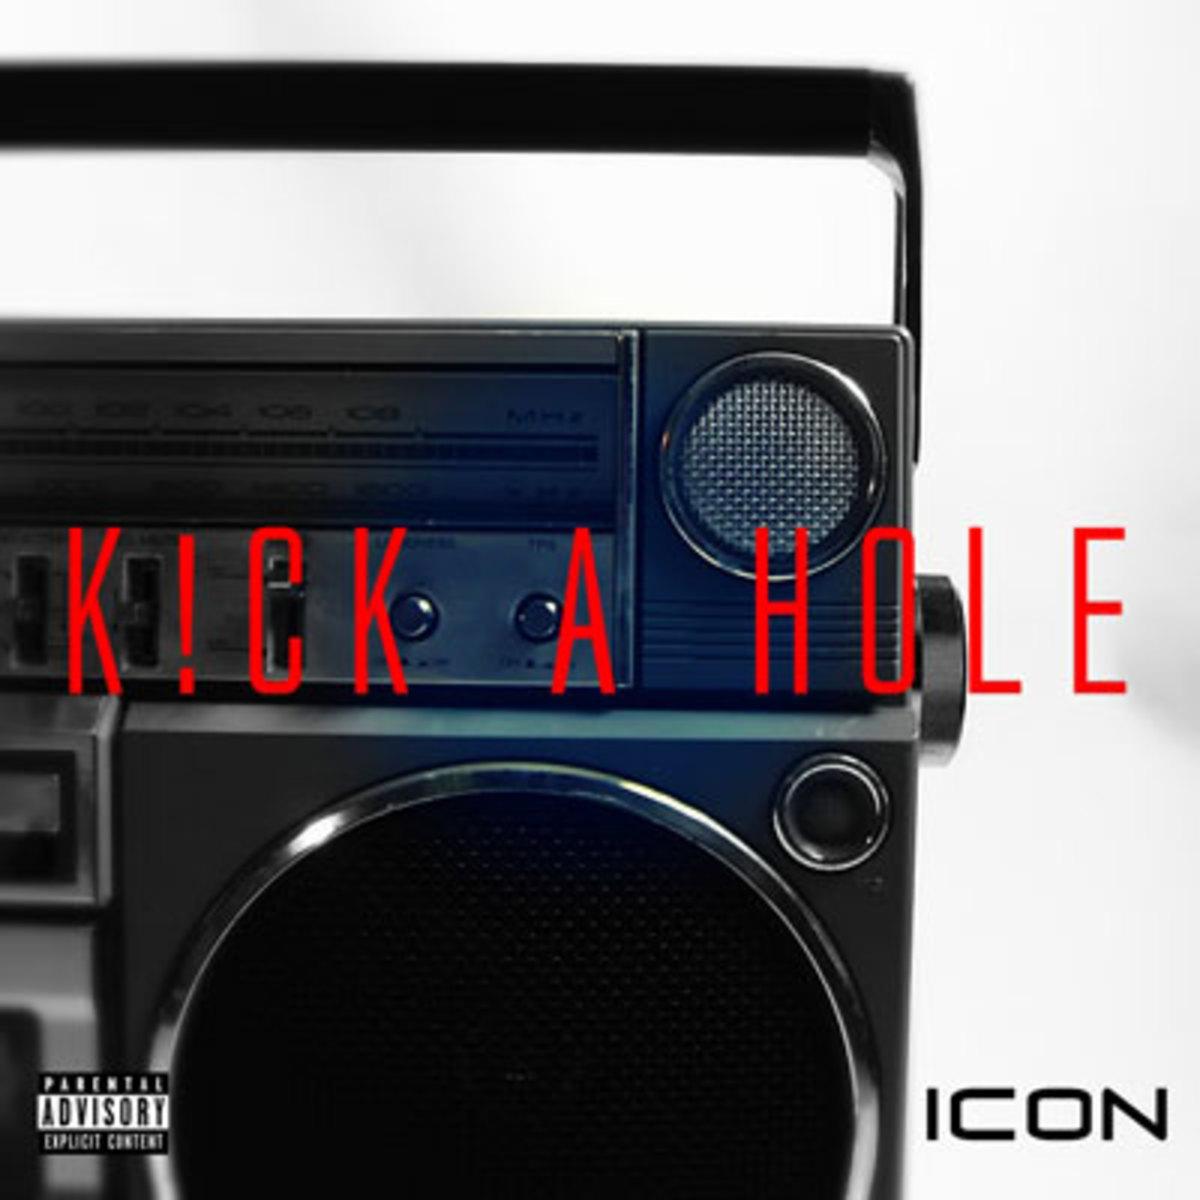 icon-kickahole.jpg